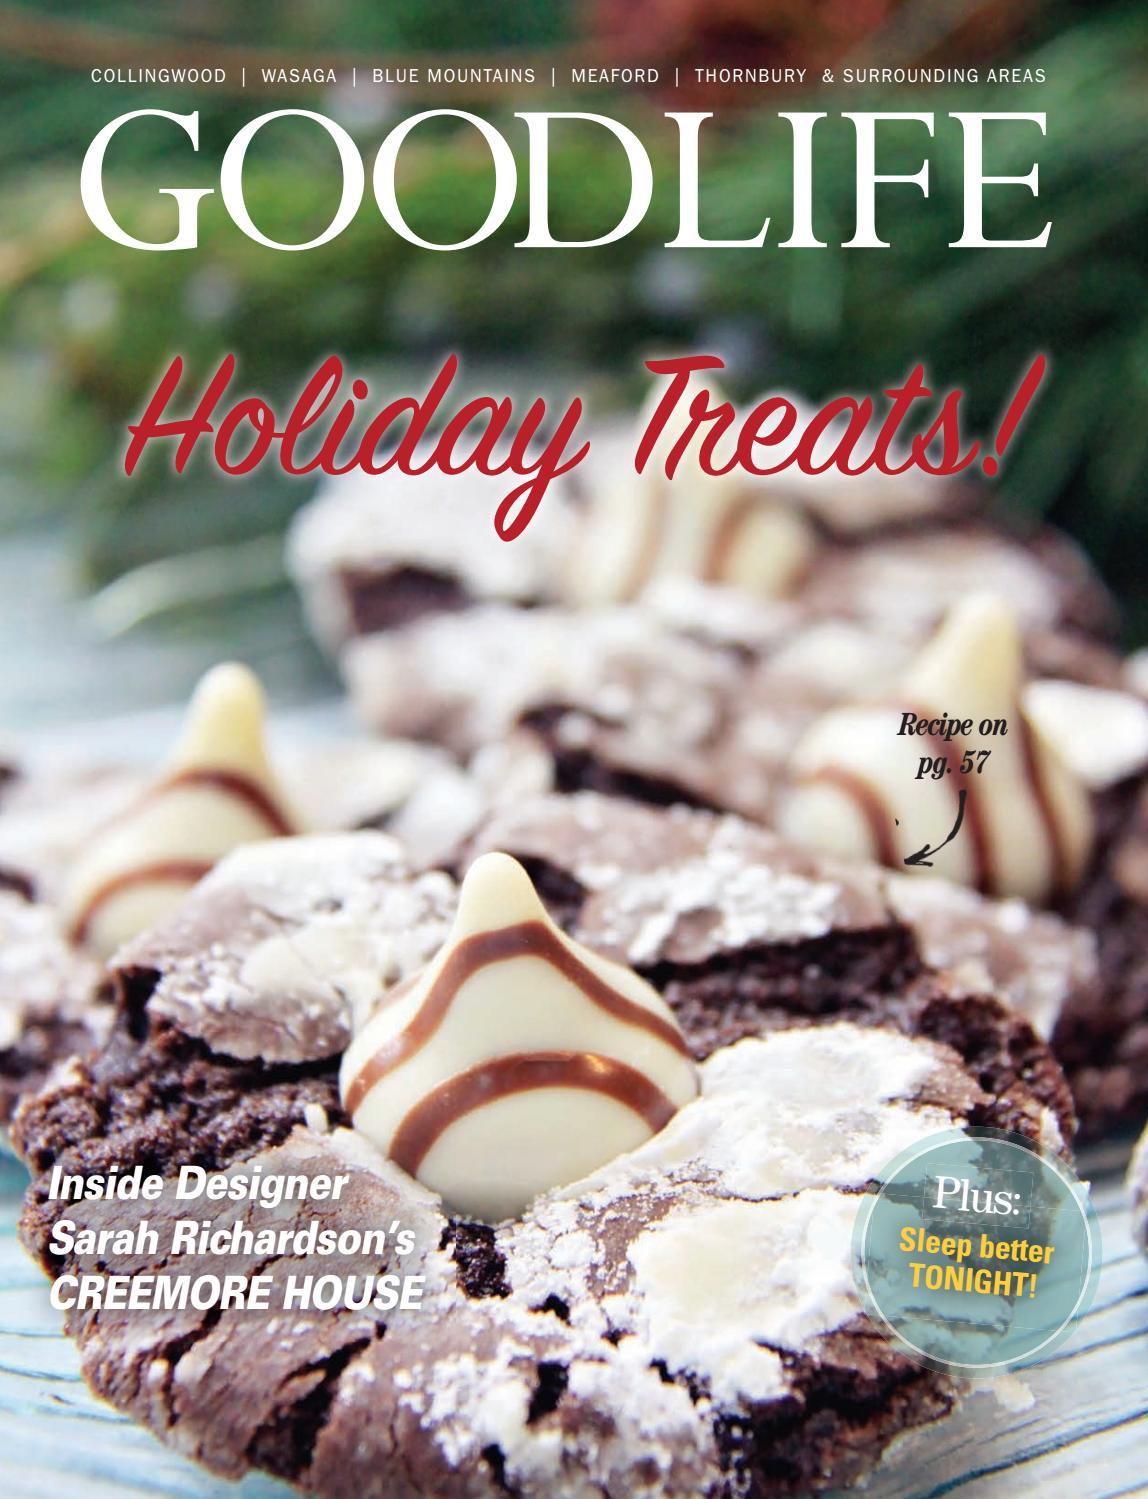 GOODLIFE GEORGIAN BAY WINTER 2017 by GoodLife Magazine - Simcoe County -  issuu